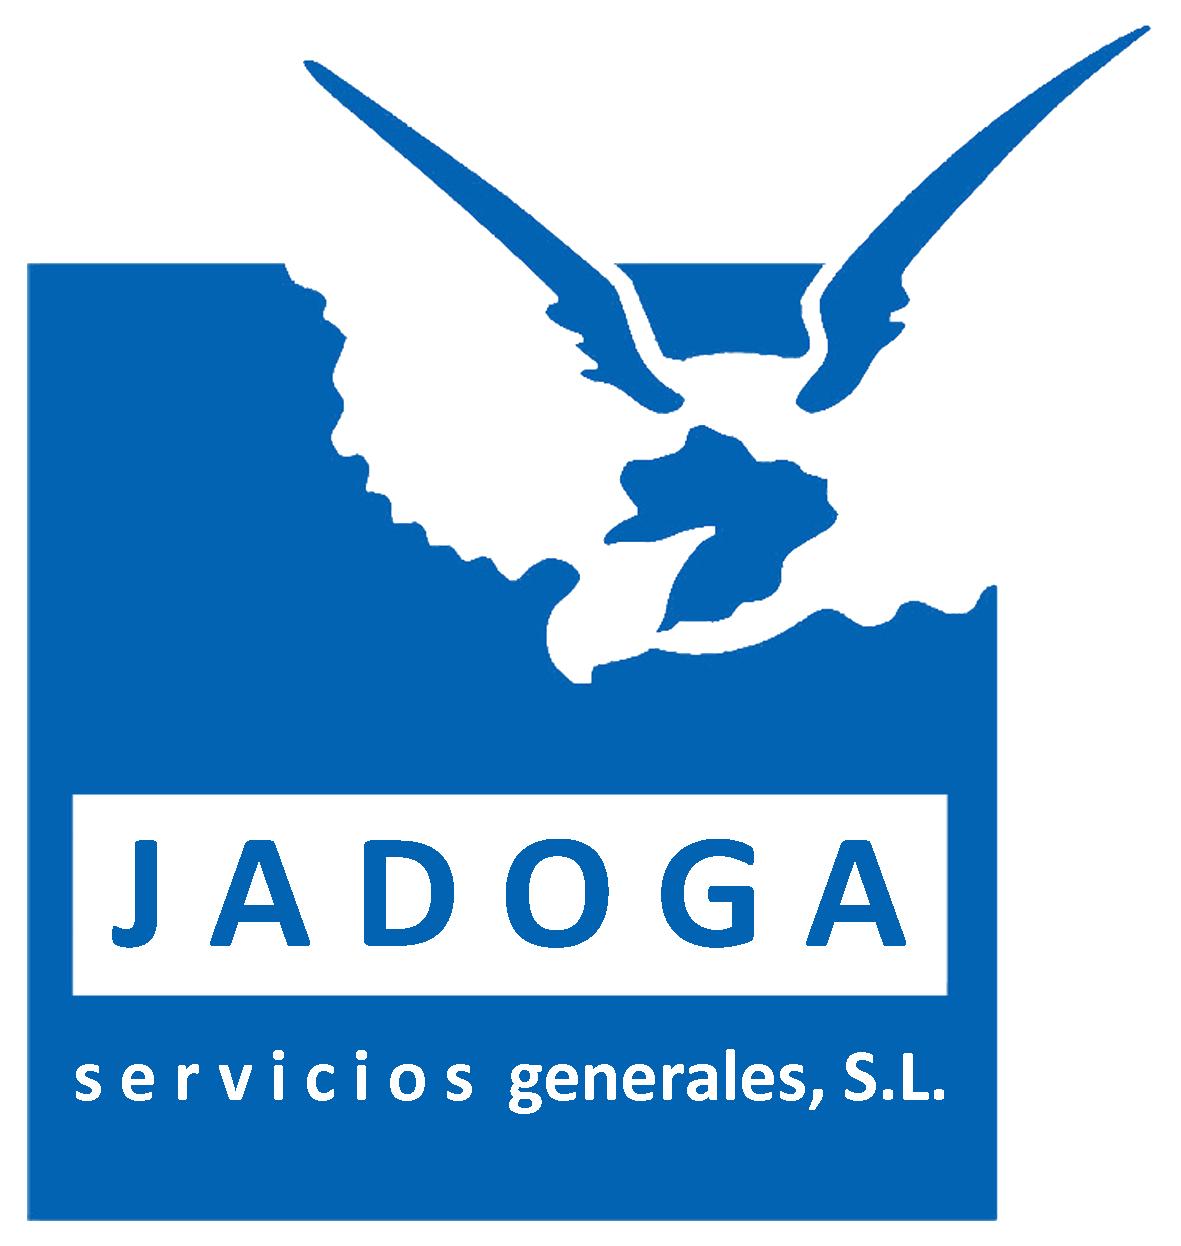 Servicios Generales Jadoga S.l.